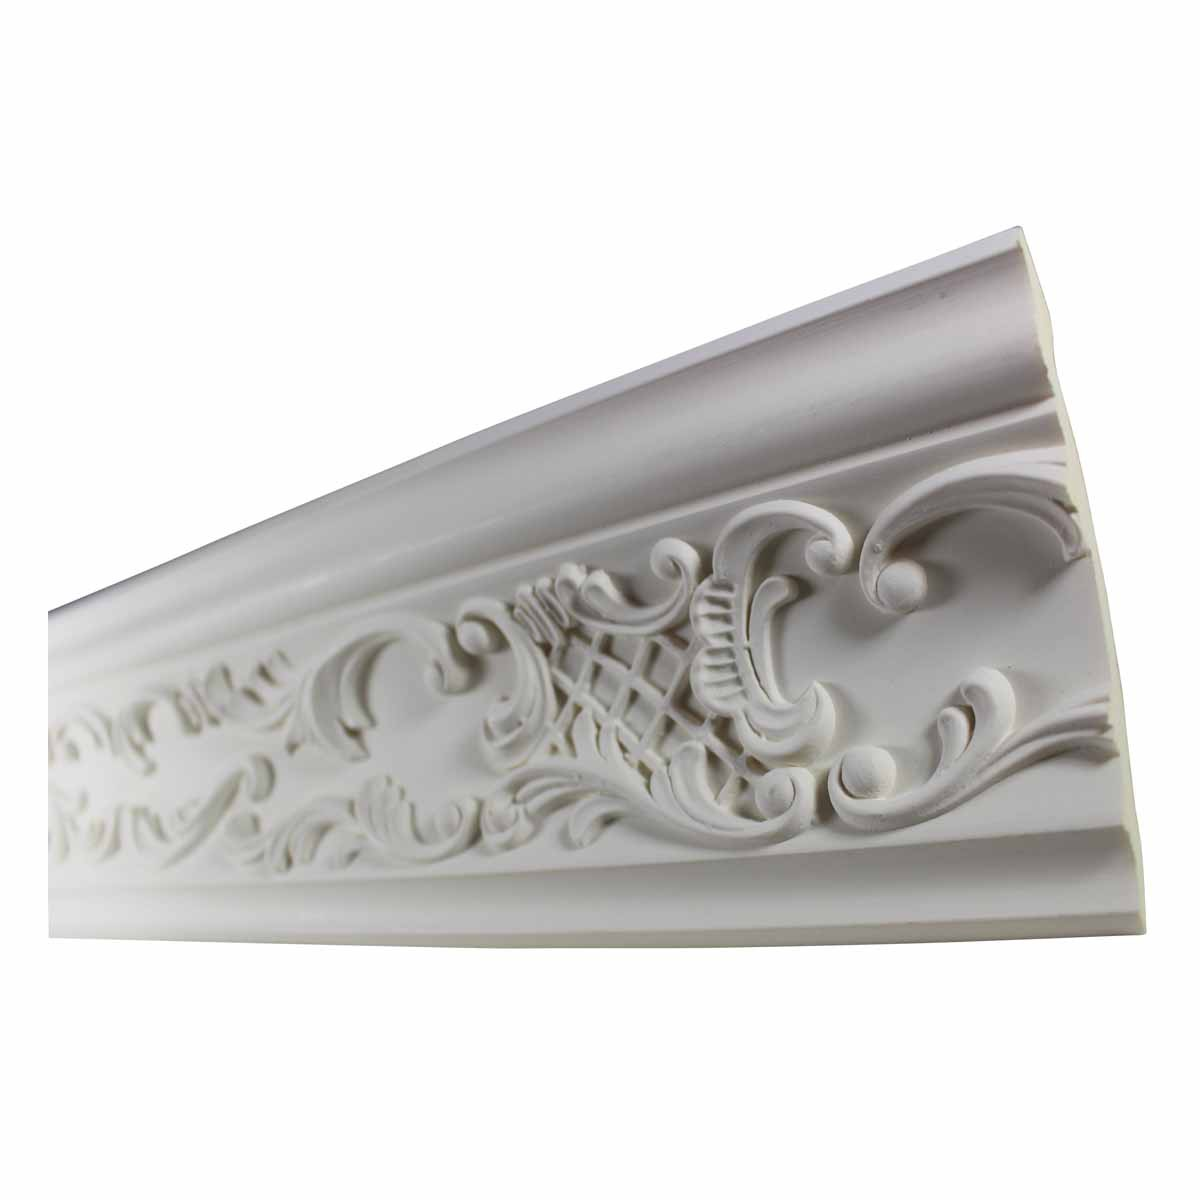 Cornice White Urethane Sample of 11372 23.5 Long Cornice Cornice Moulding Cornice Molding